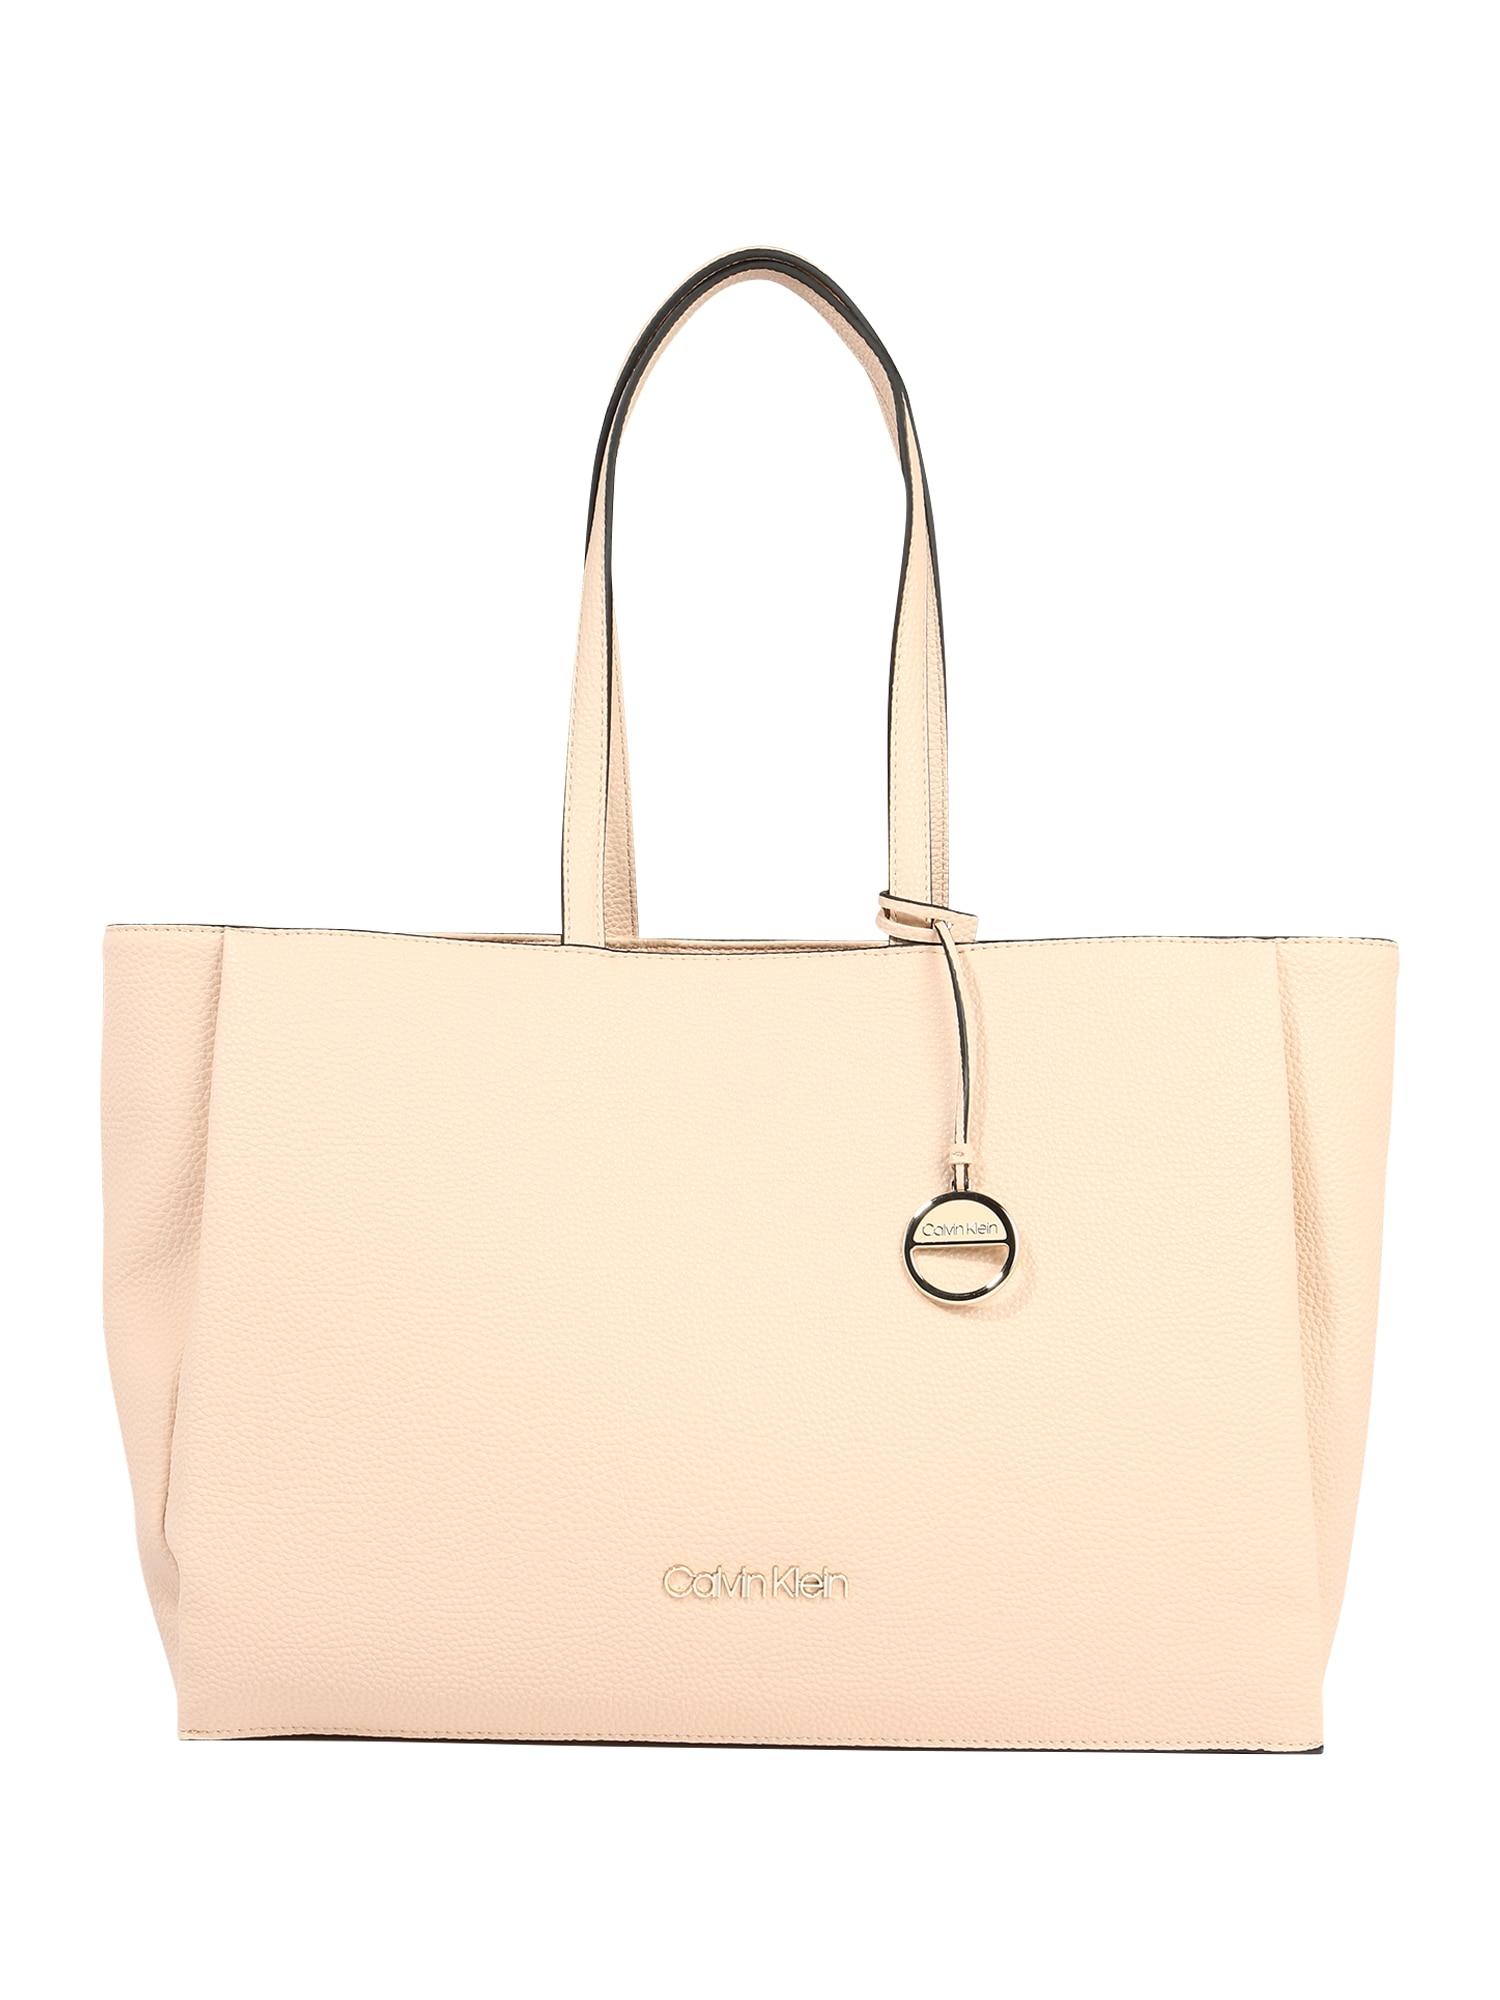 Calvin Klein Pirkinių krepšys 'SIDED SHOPPER W/ LAPTOP SLEEVE' gelsvai pilka spalva